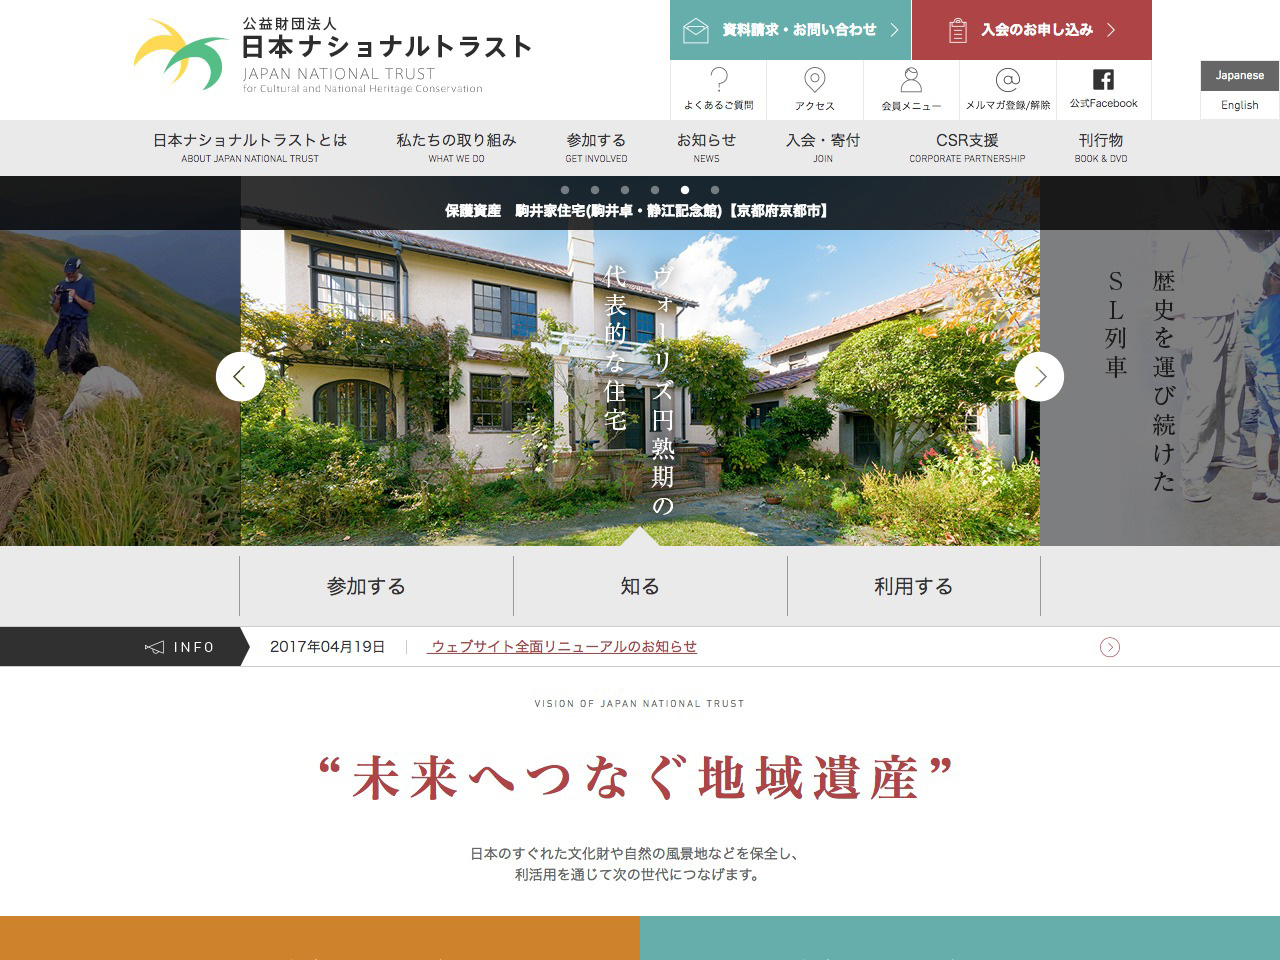 works jnt web 1 公益財団法人日本ナショナルトラスト